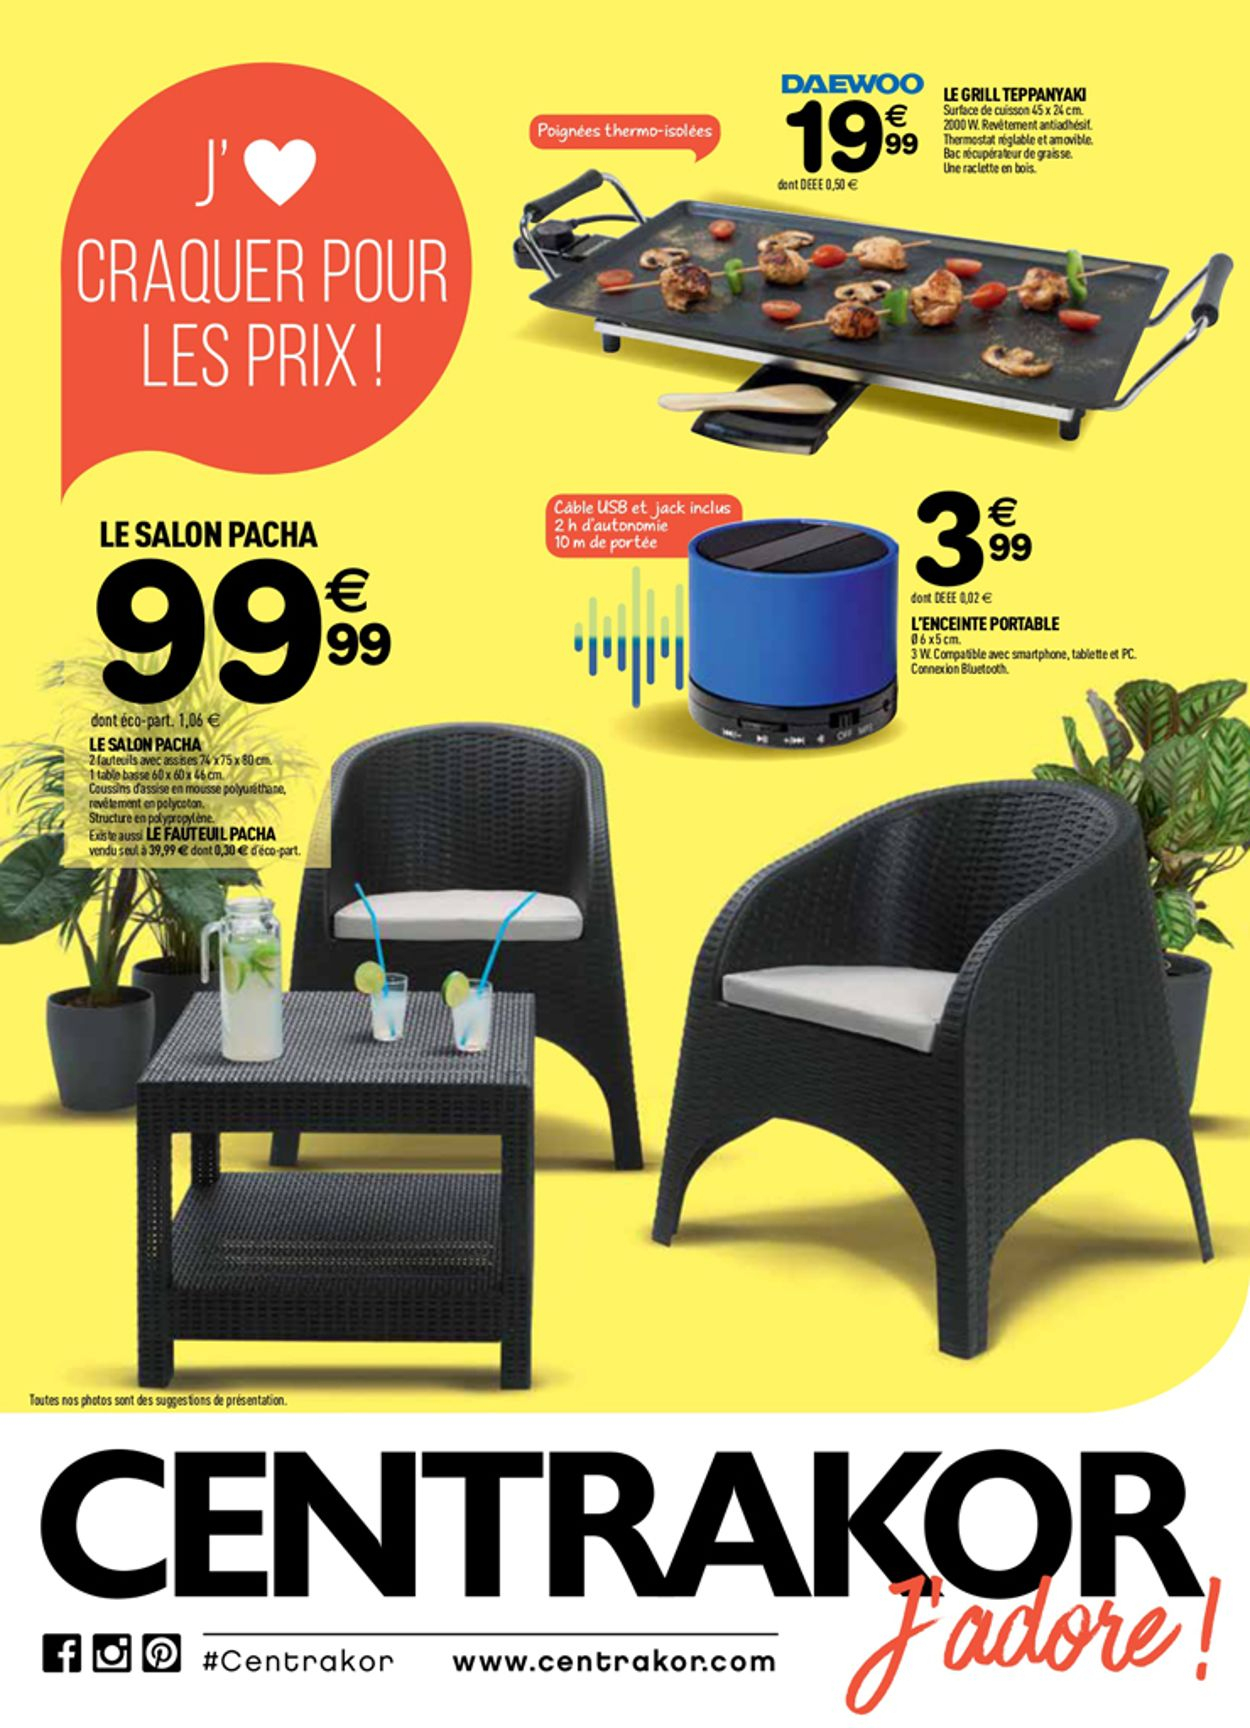 Centrakor Catalogue Actuel 01.07 - 14.07.2019 - Catalogue-24 avec Salon De Jardin Centrakor